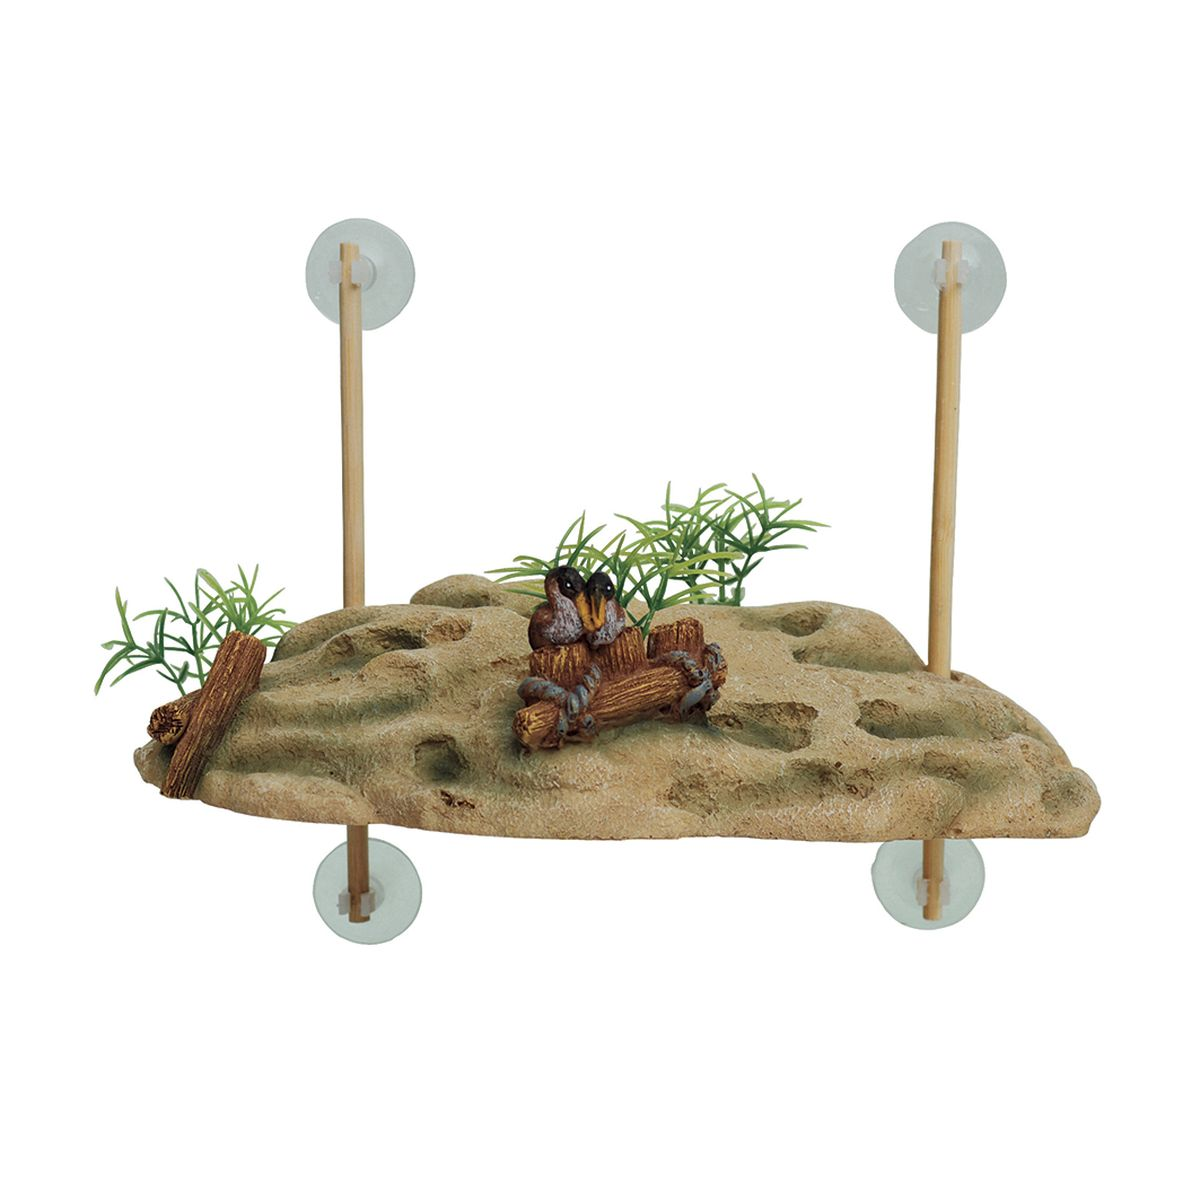 Декорация для аквариума ArtUniq Островок для черепах, на присосках, 24,5 x 11,5 x 7,5 см